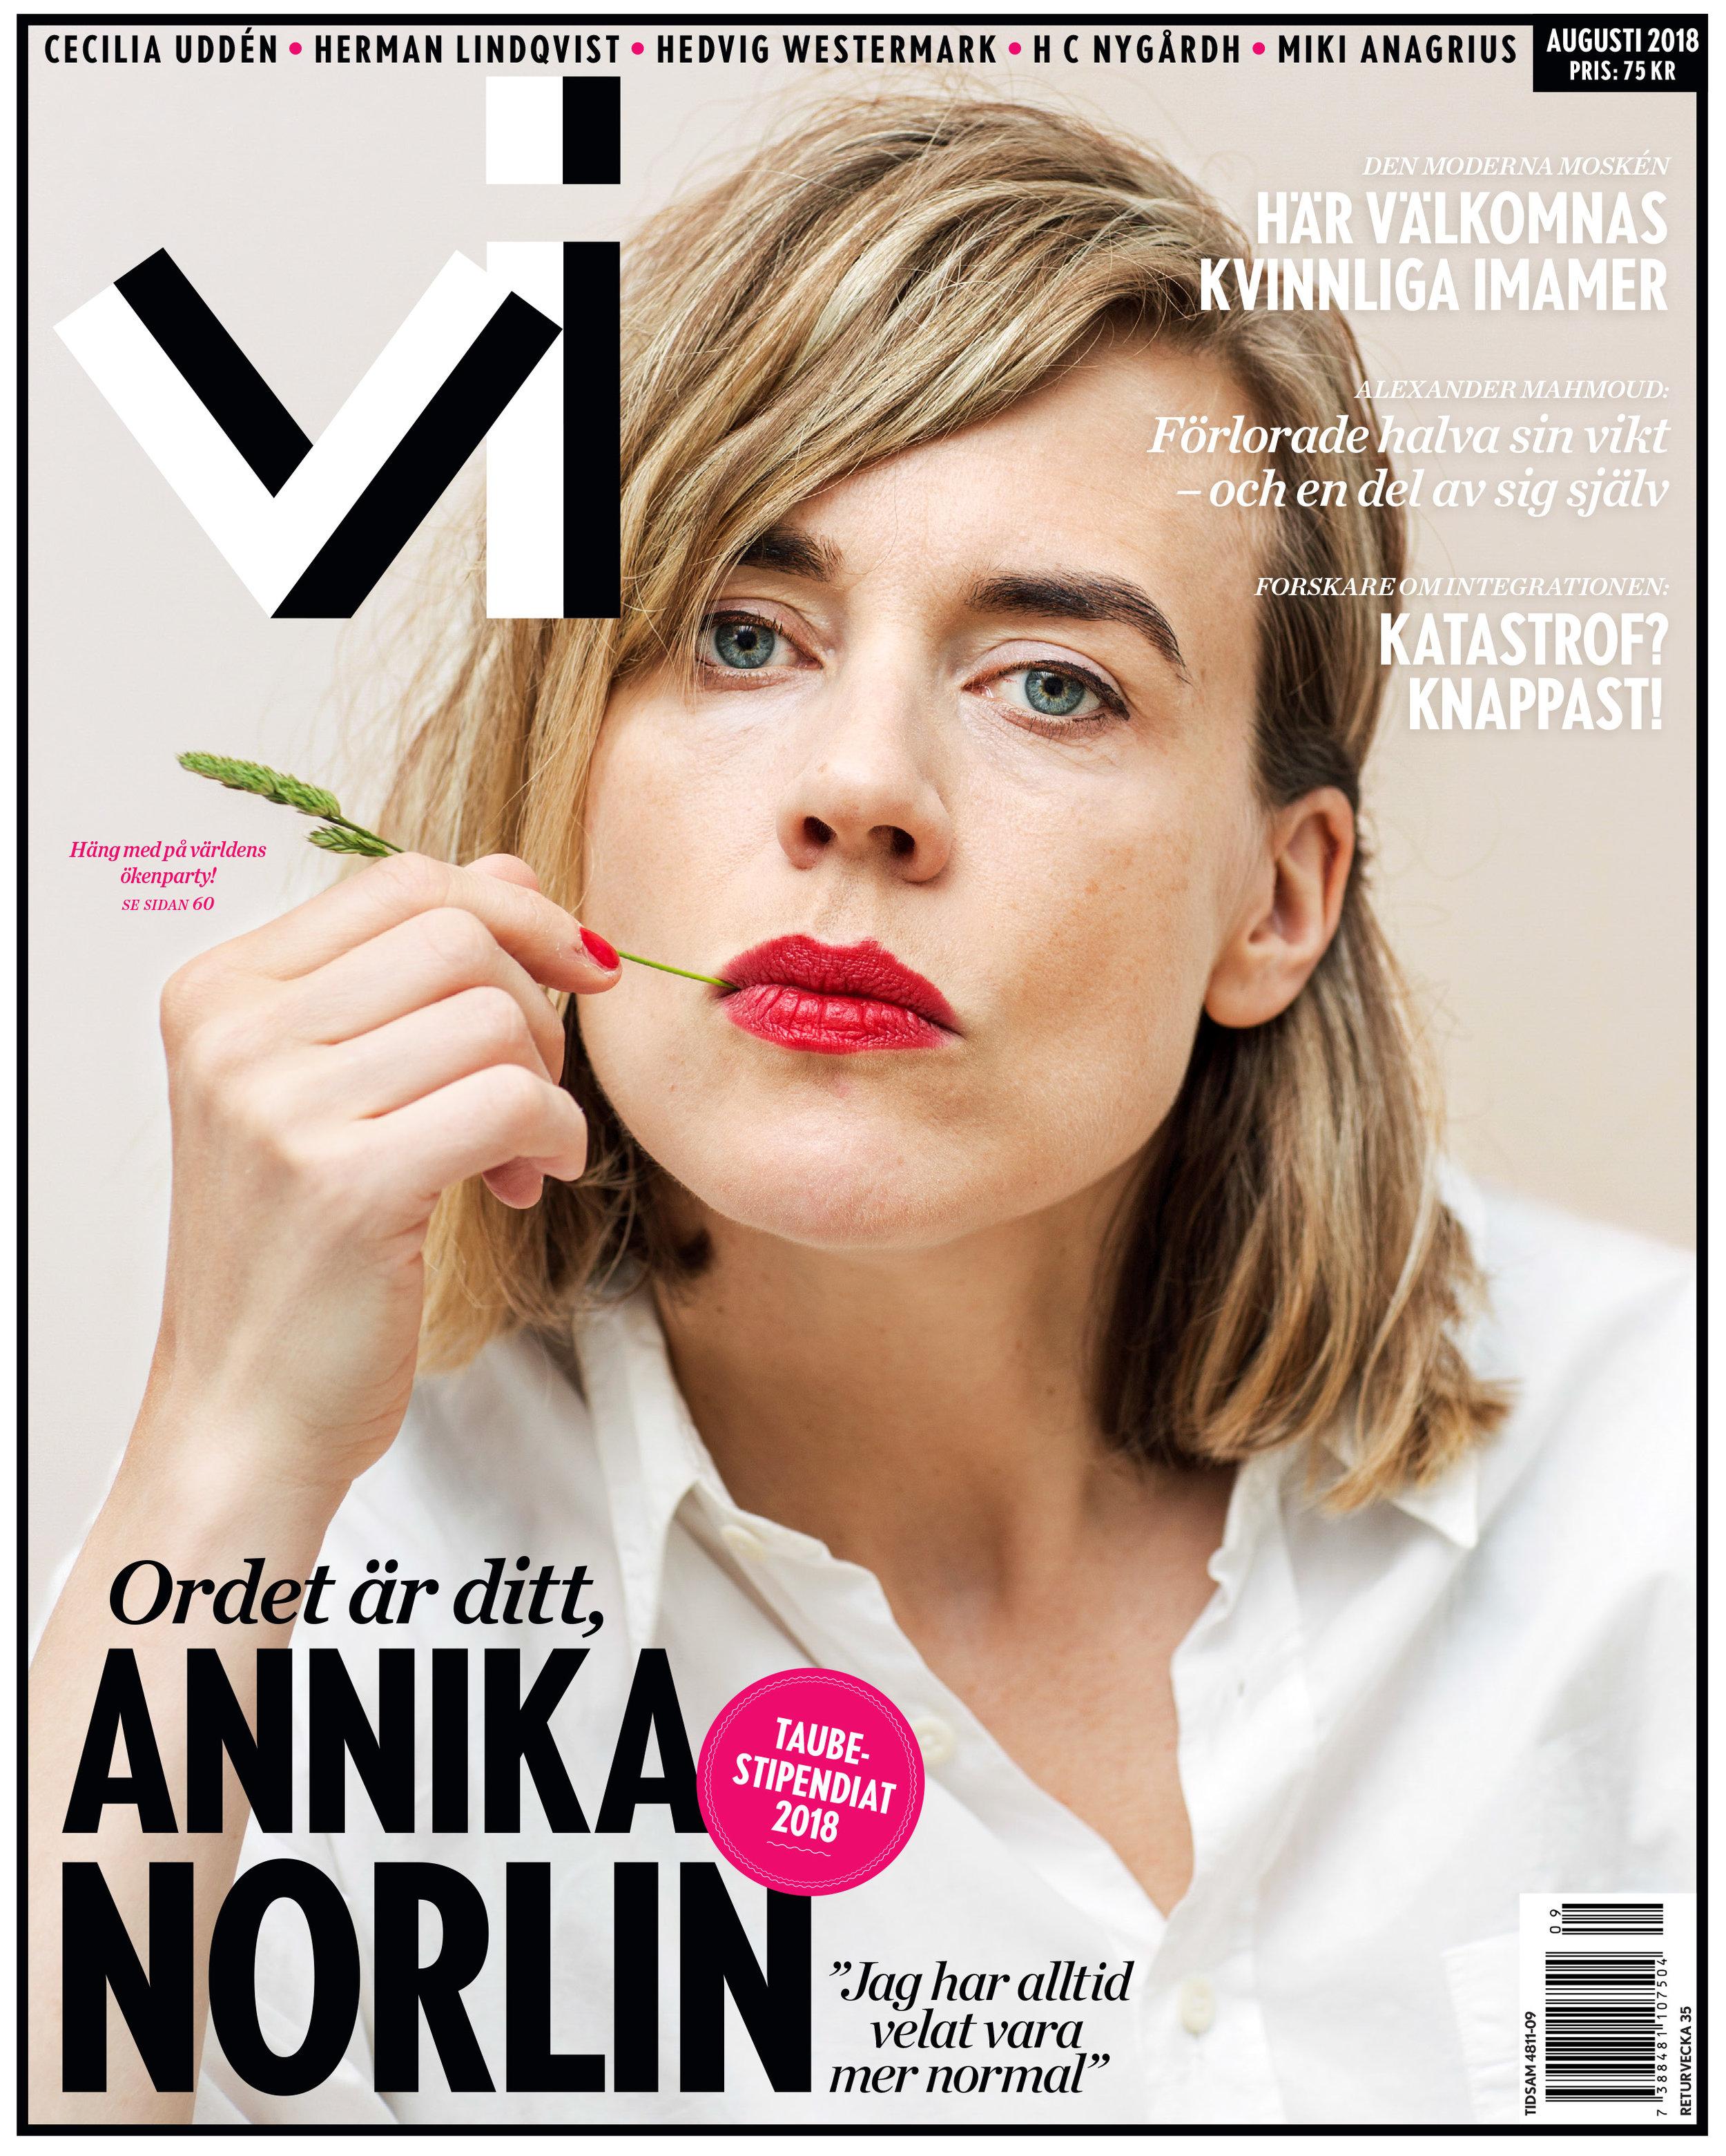 ANNIKA_VI1.jpg